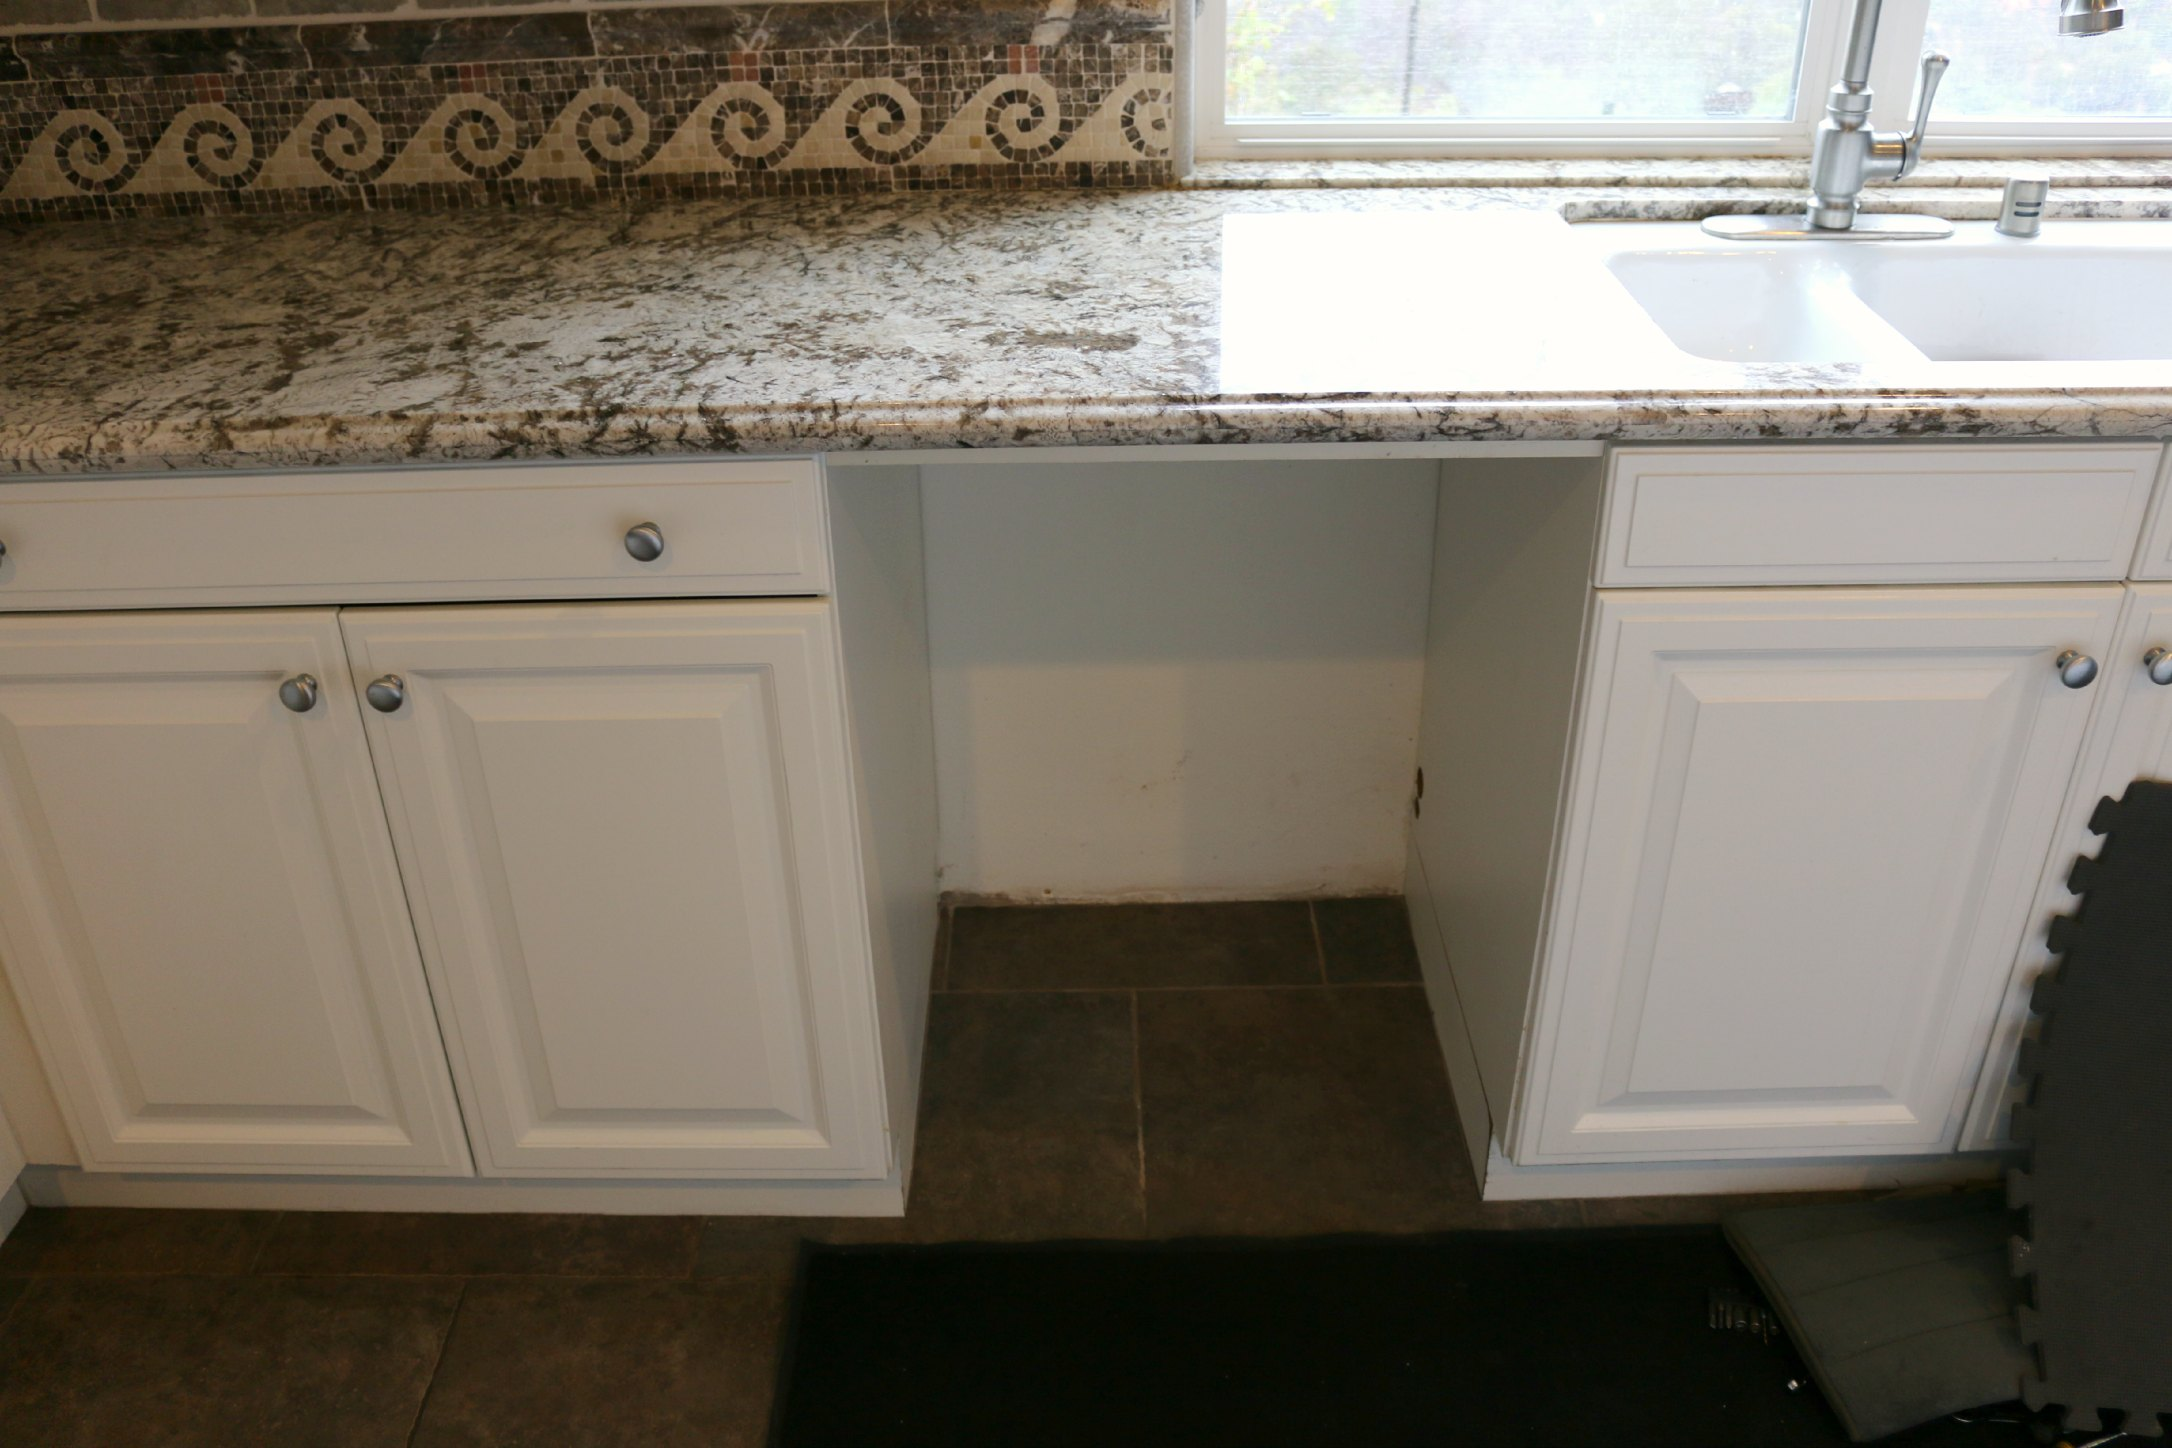 samsung dishwasher review